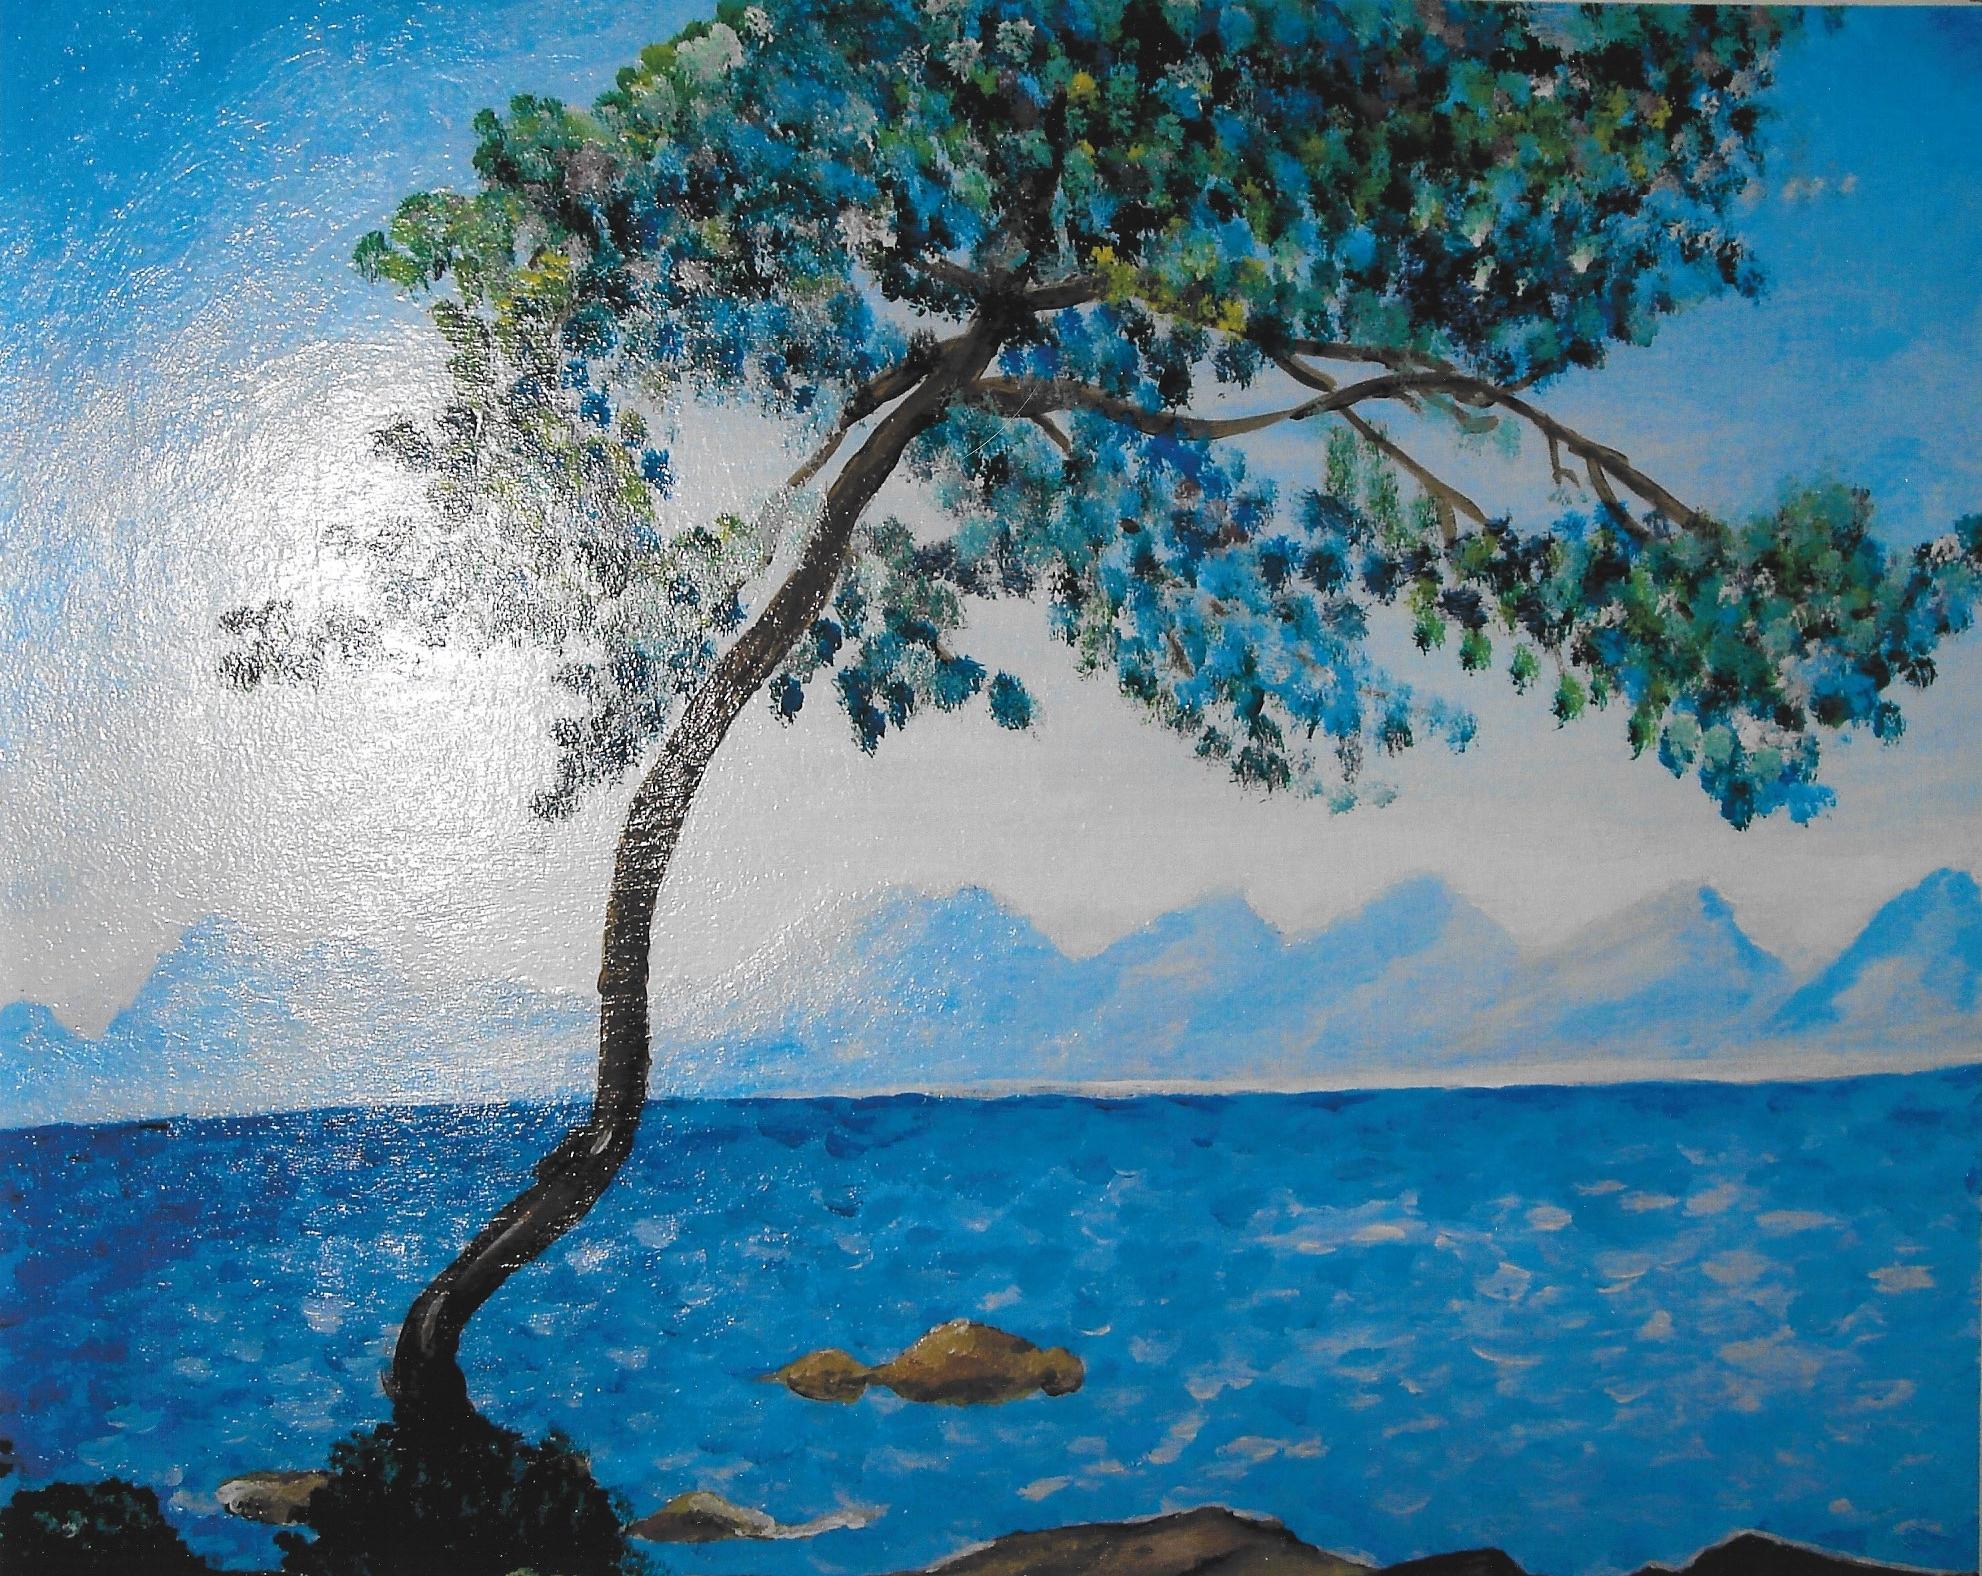 Monet replica, acrylic on a wall